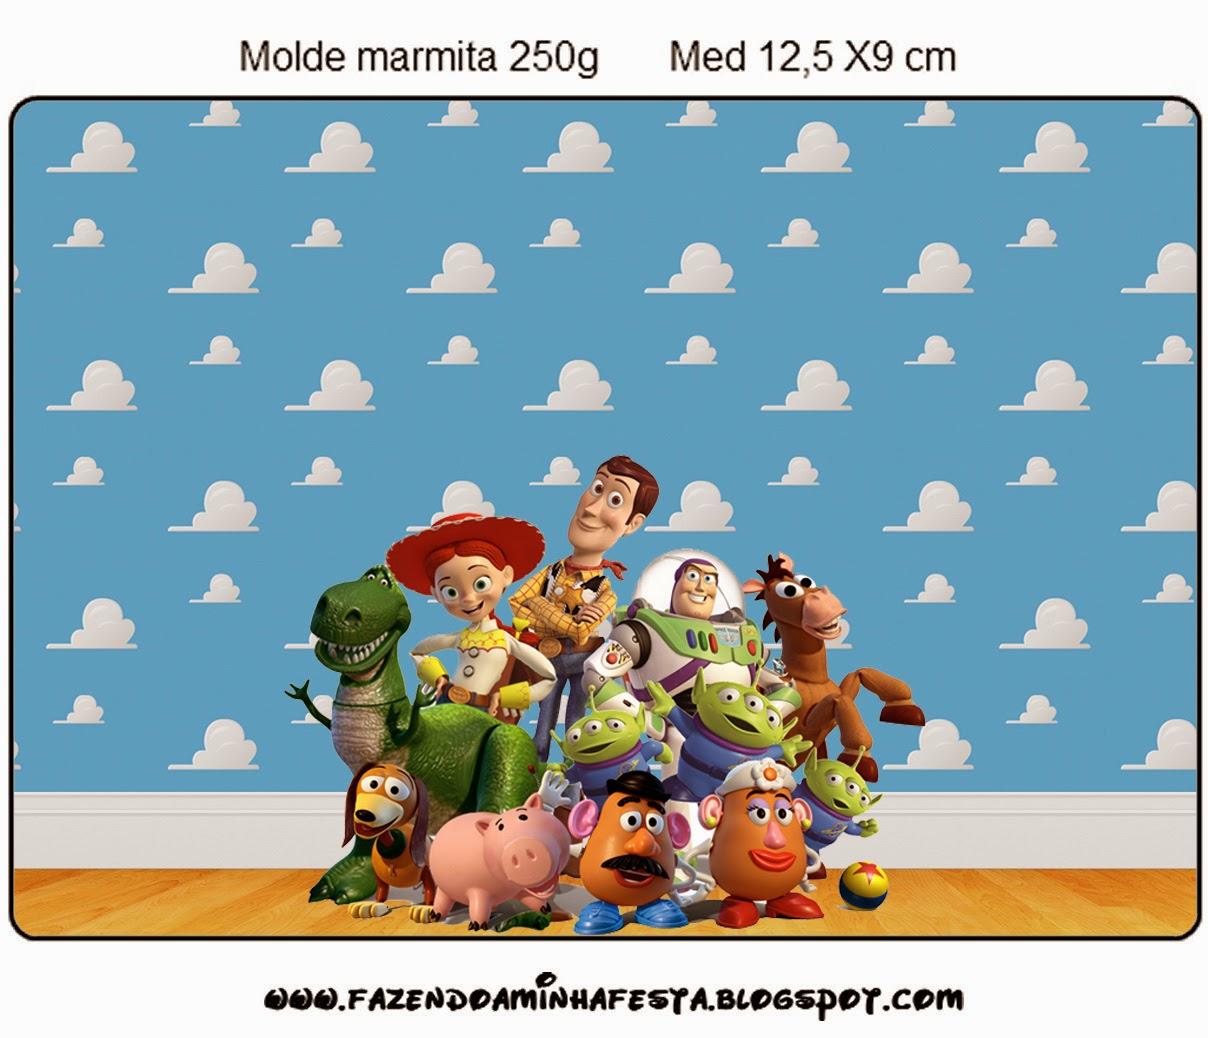 Etiquetas de Toy Story 3 para imprimir gratis.